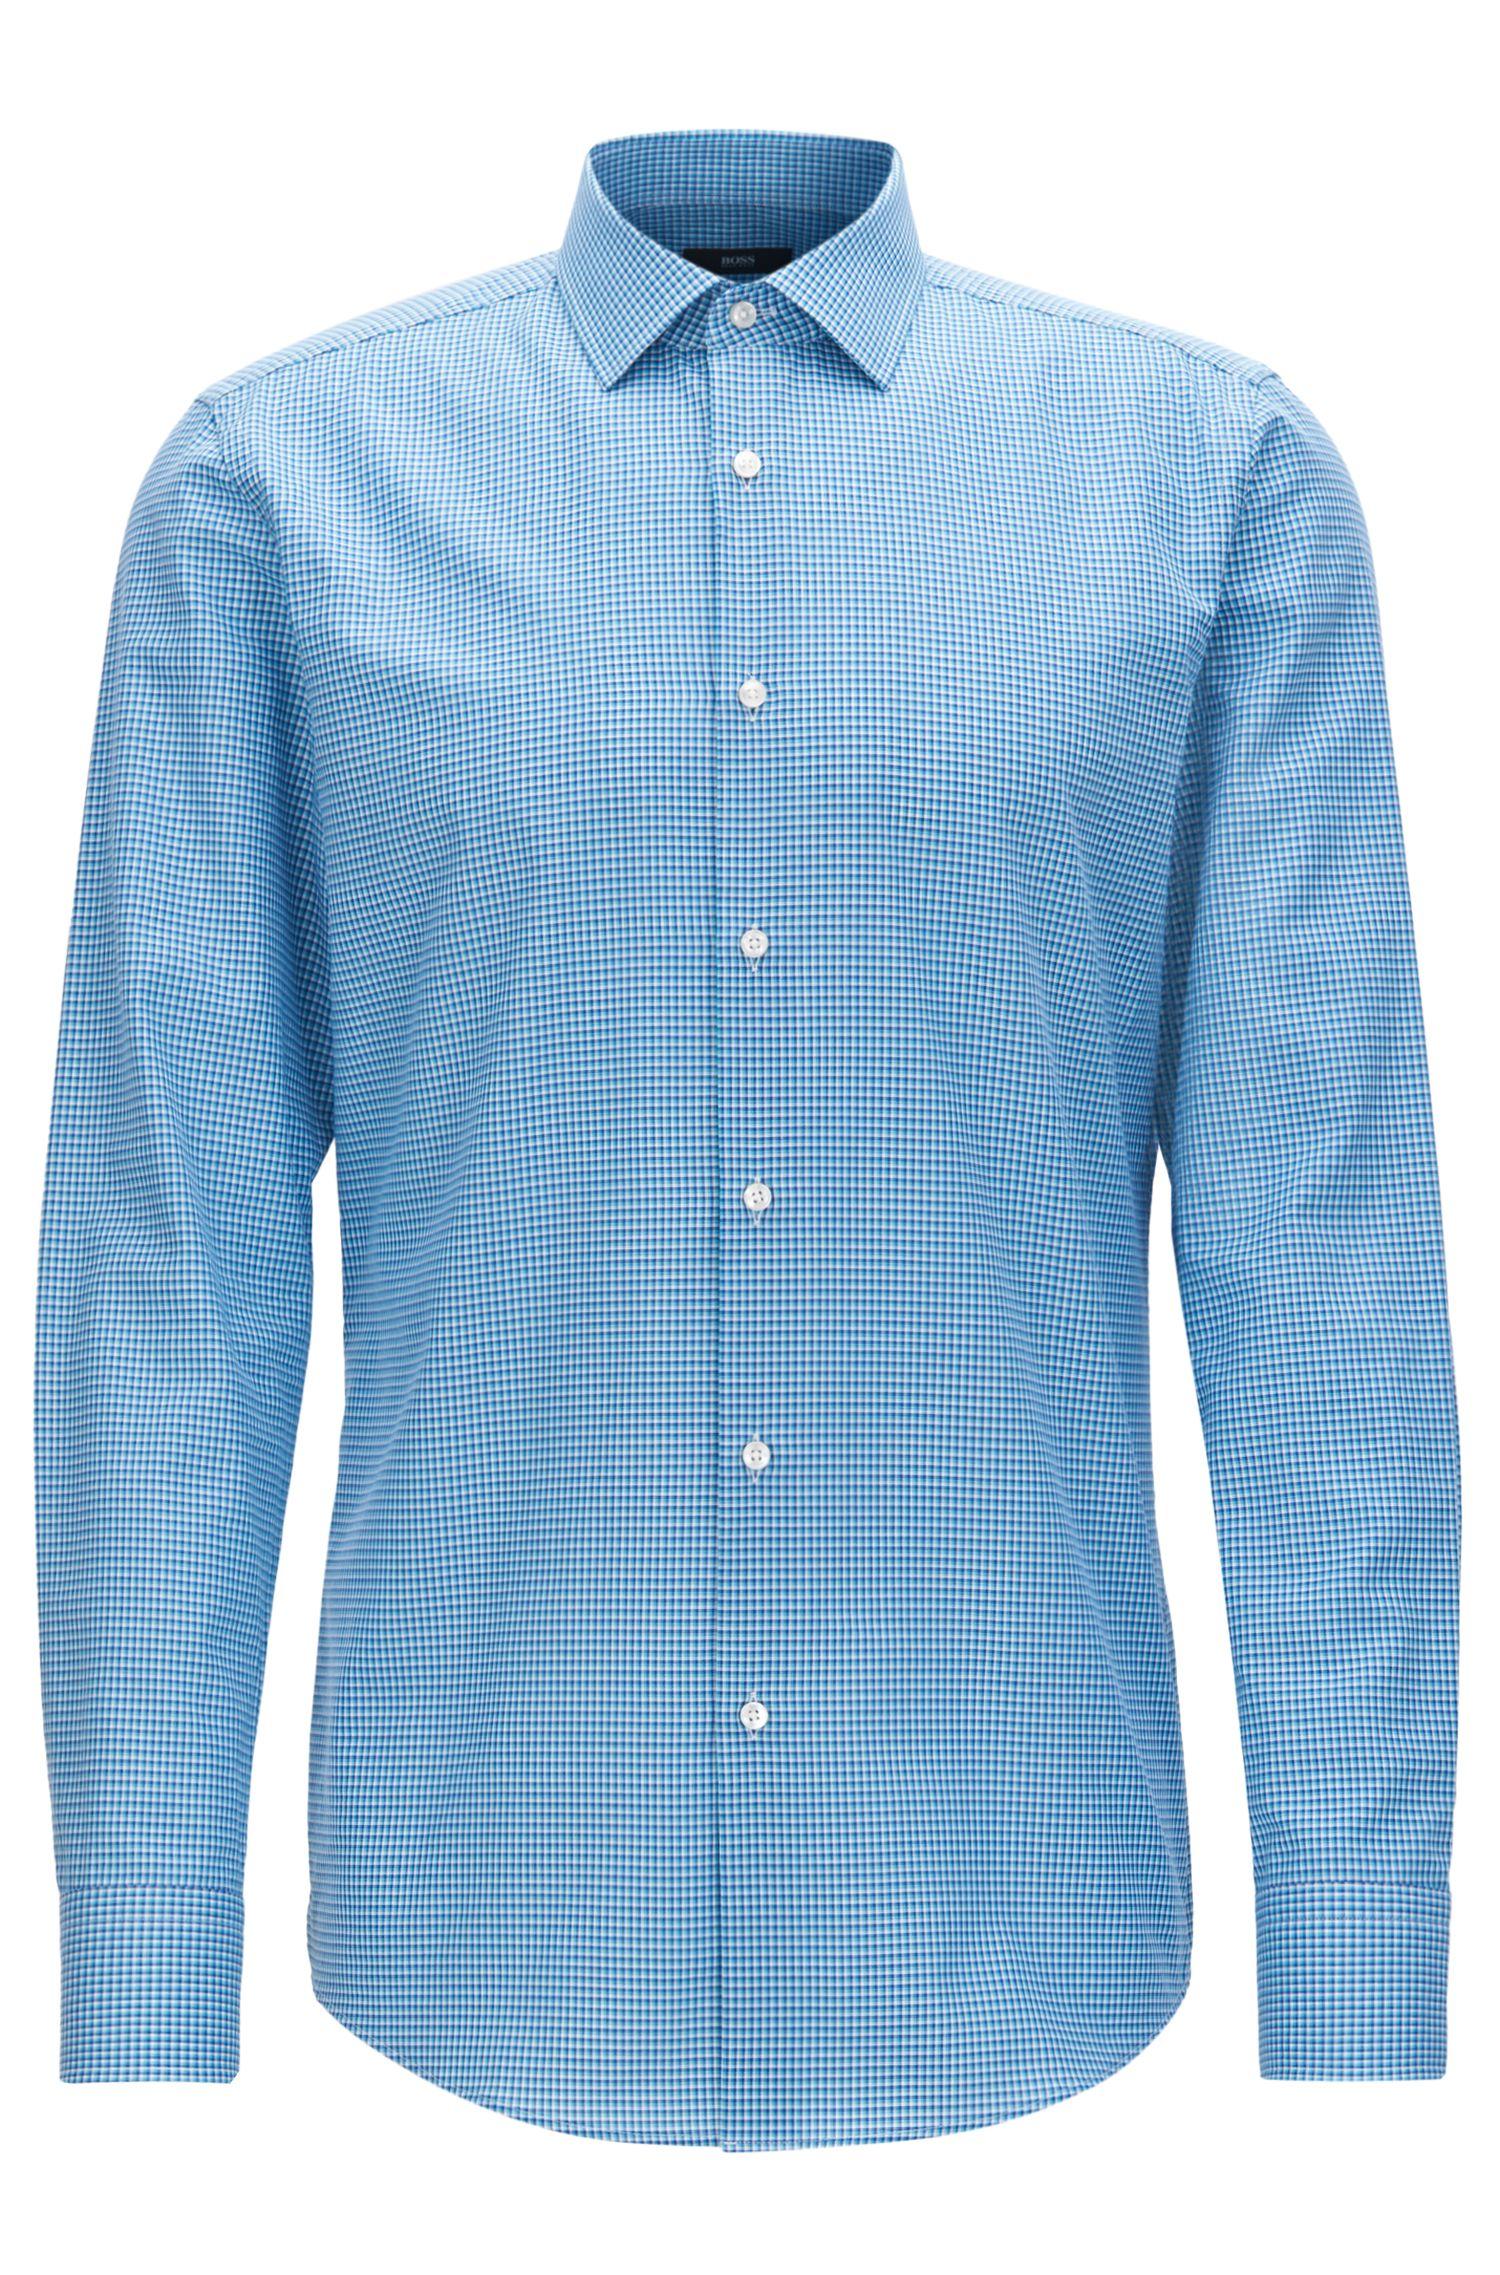 Checked Cotton Dress Shirt, Slim Fit | Jenno